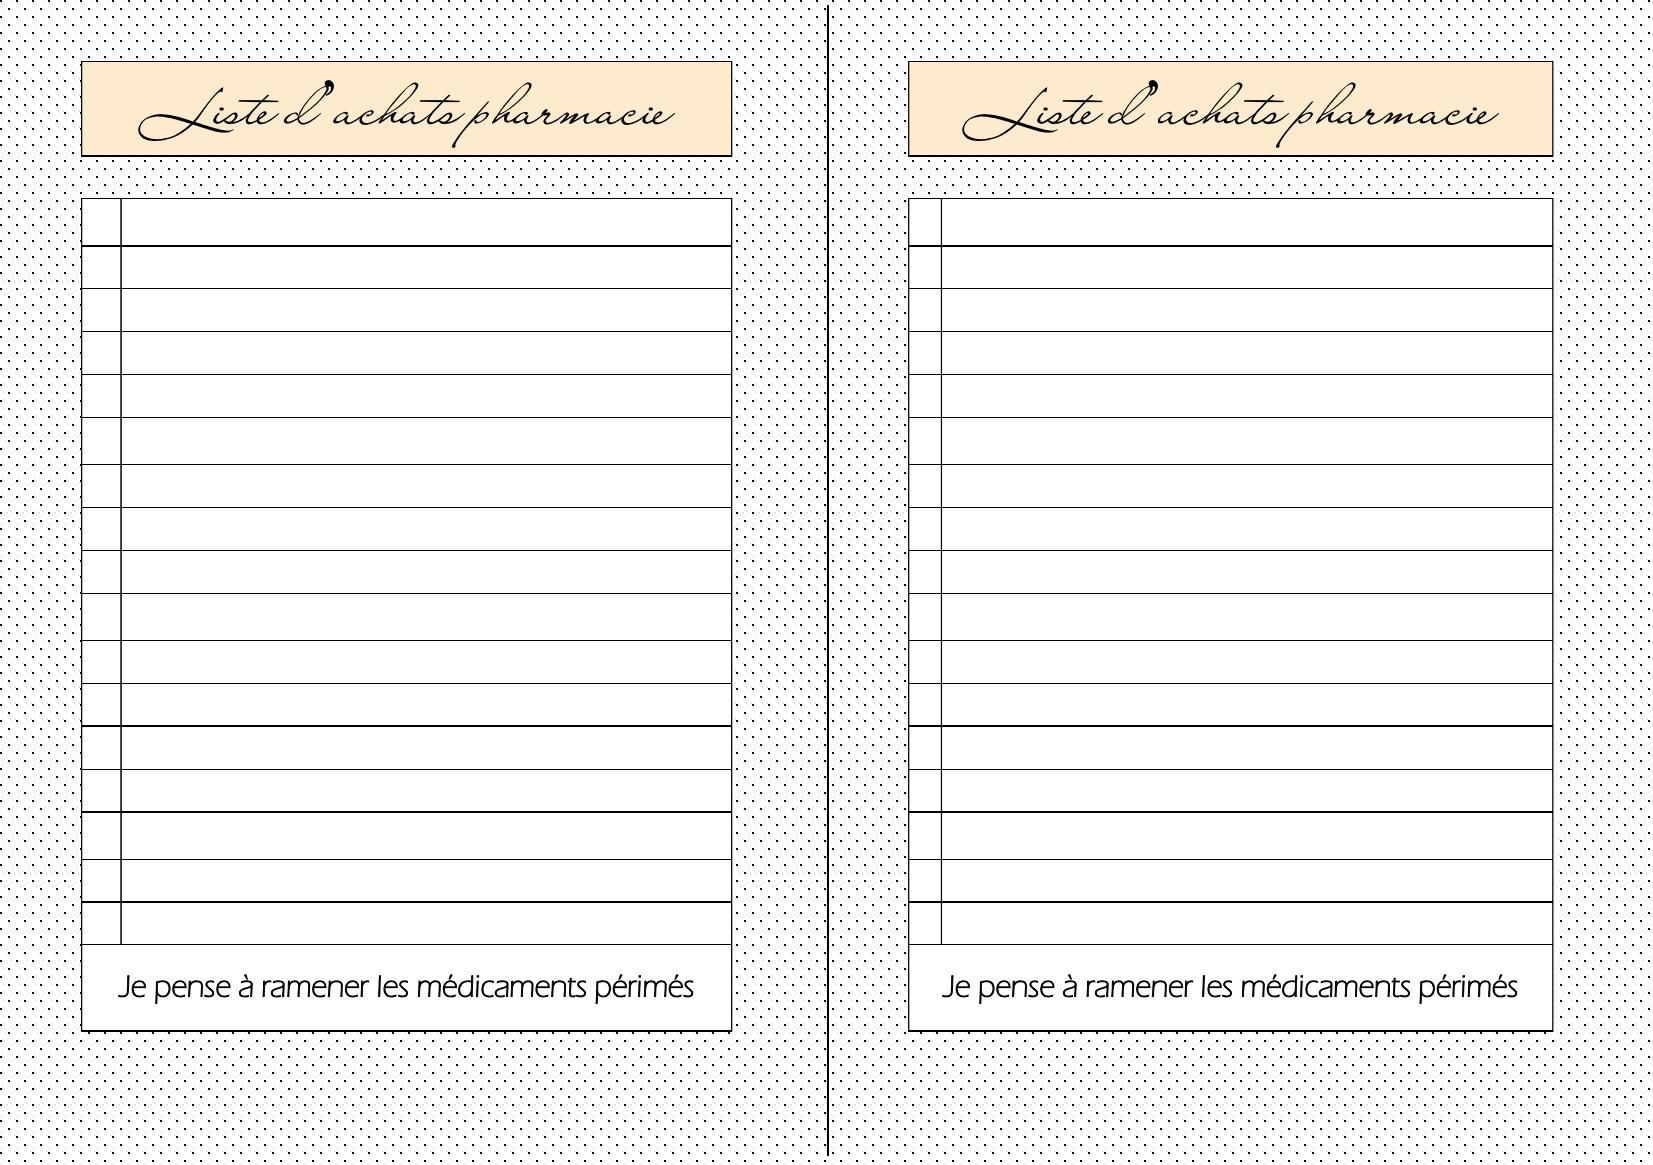 liste achats pharmacie_free printable1.jpeg